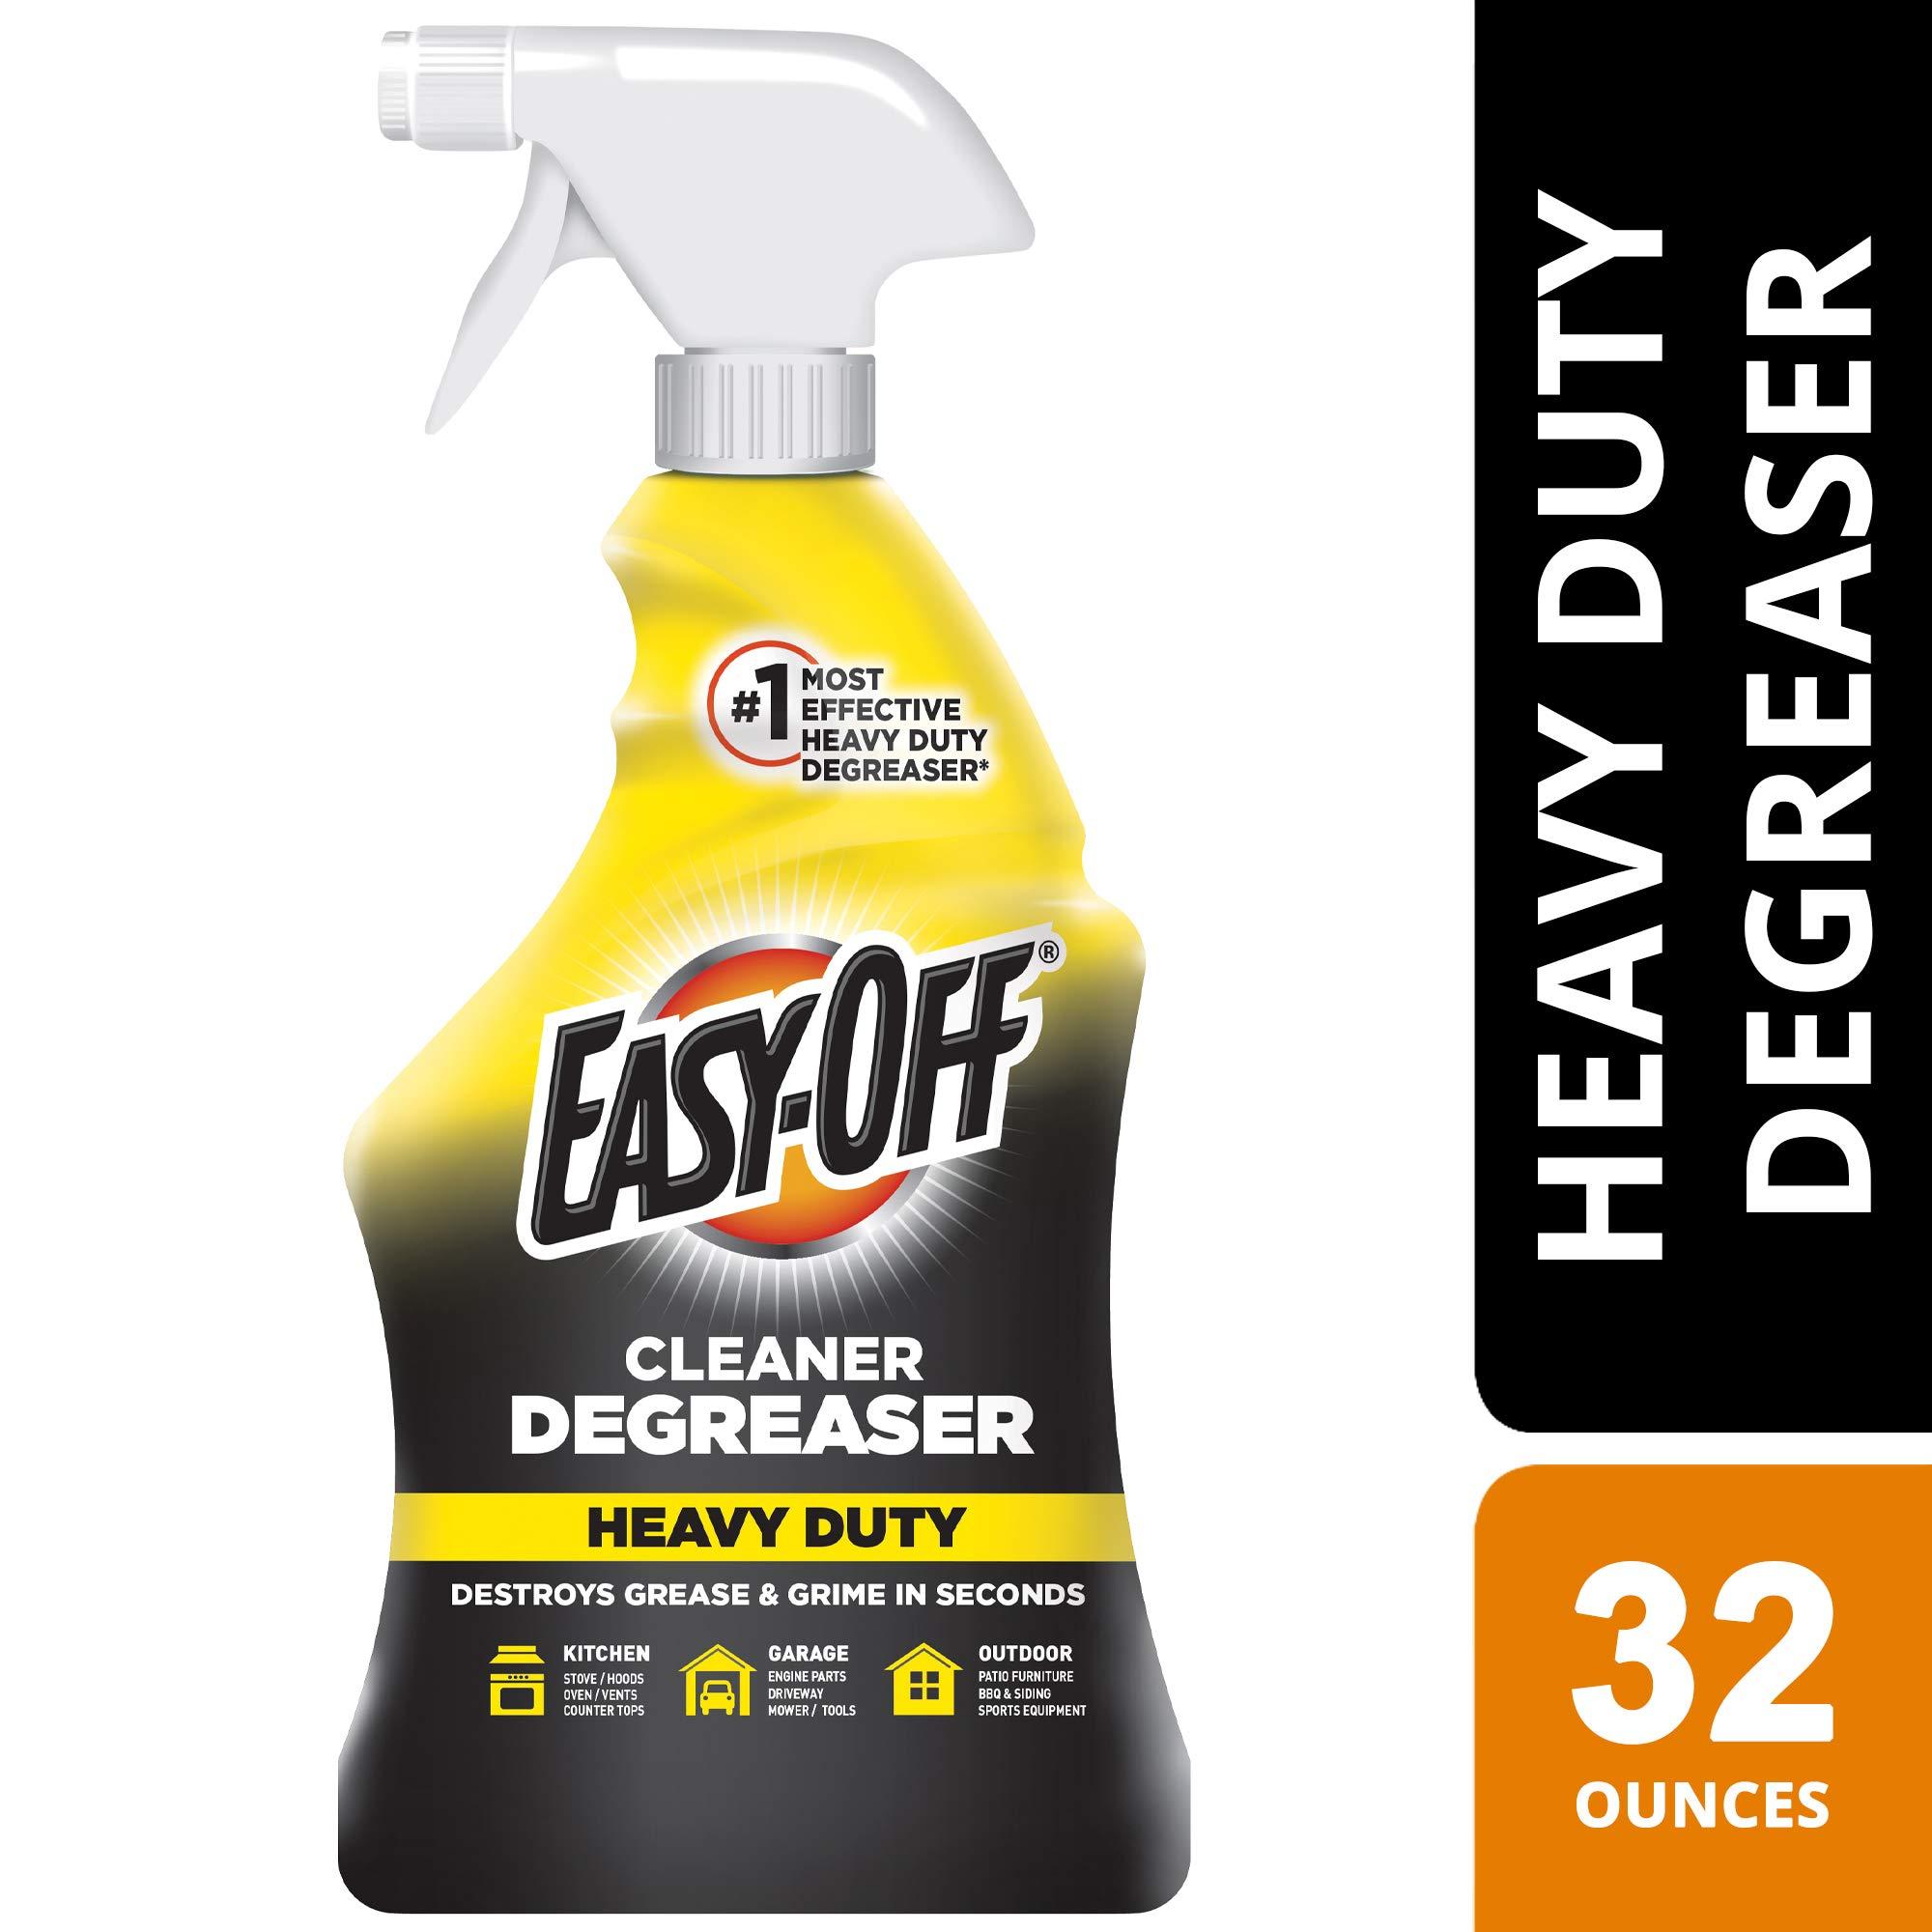 Easy Off Heavy Degreaser Cleaner